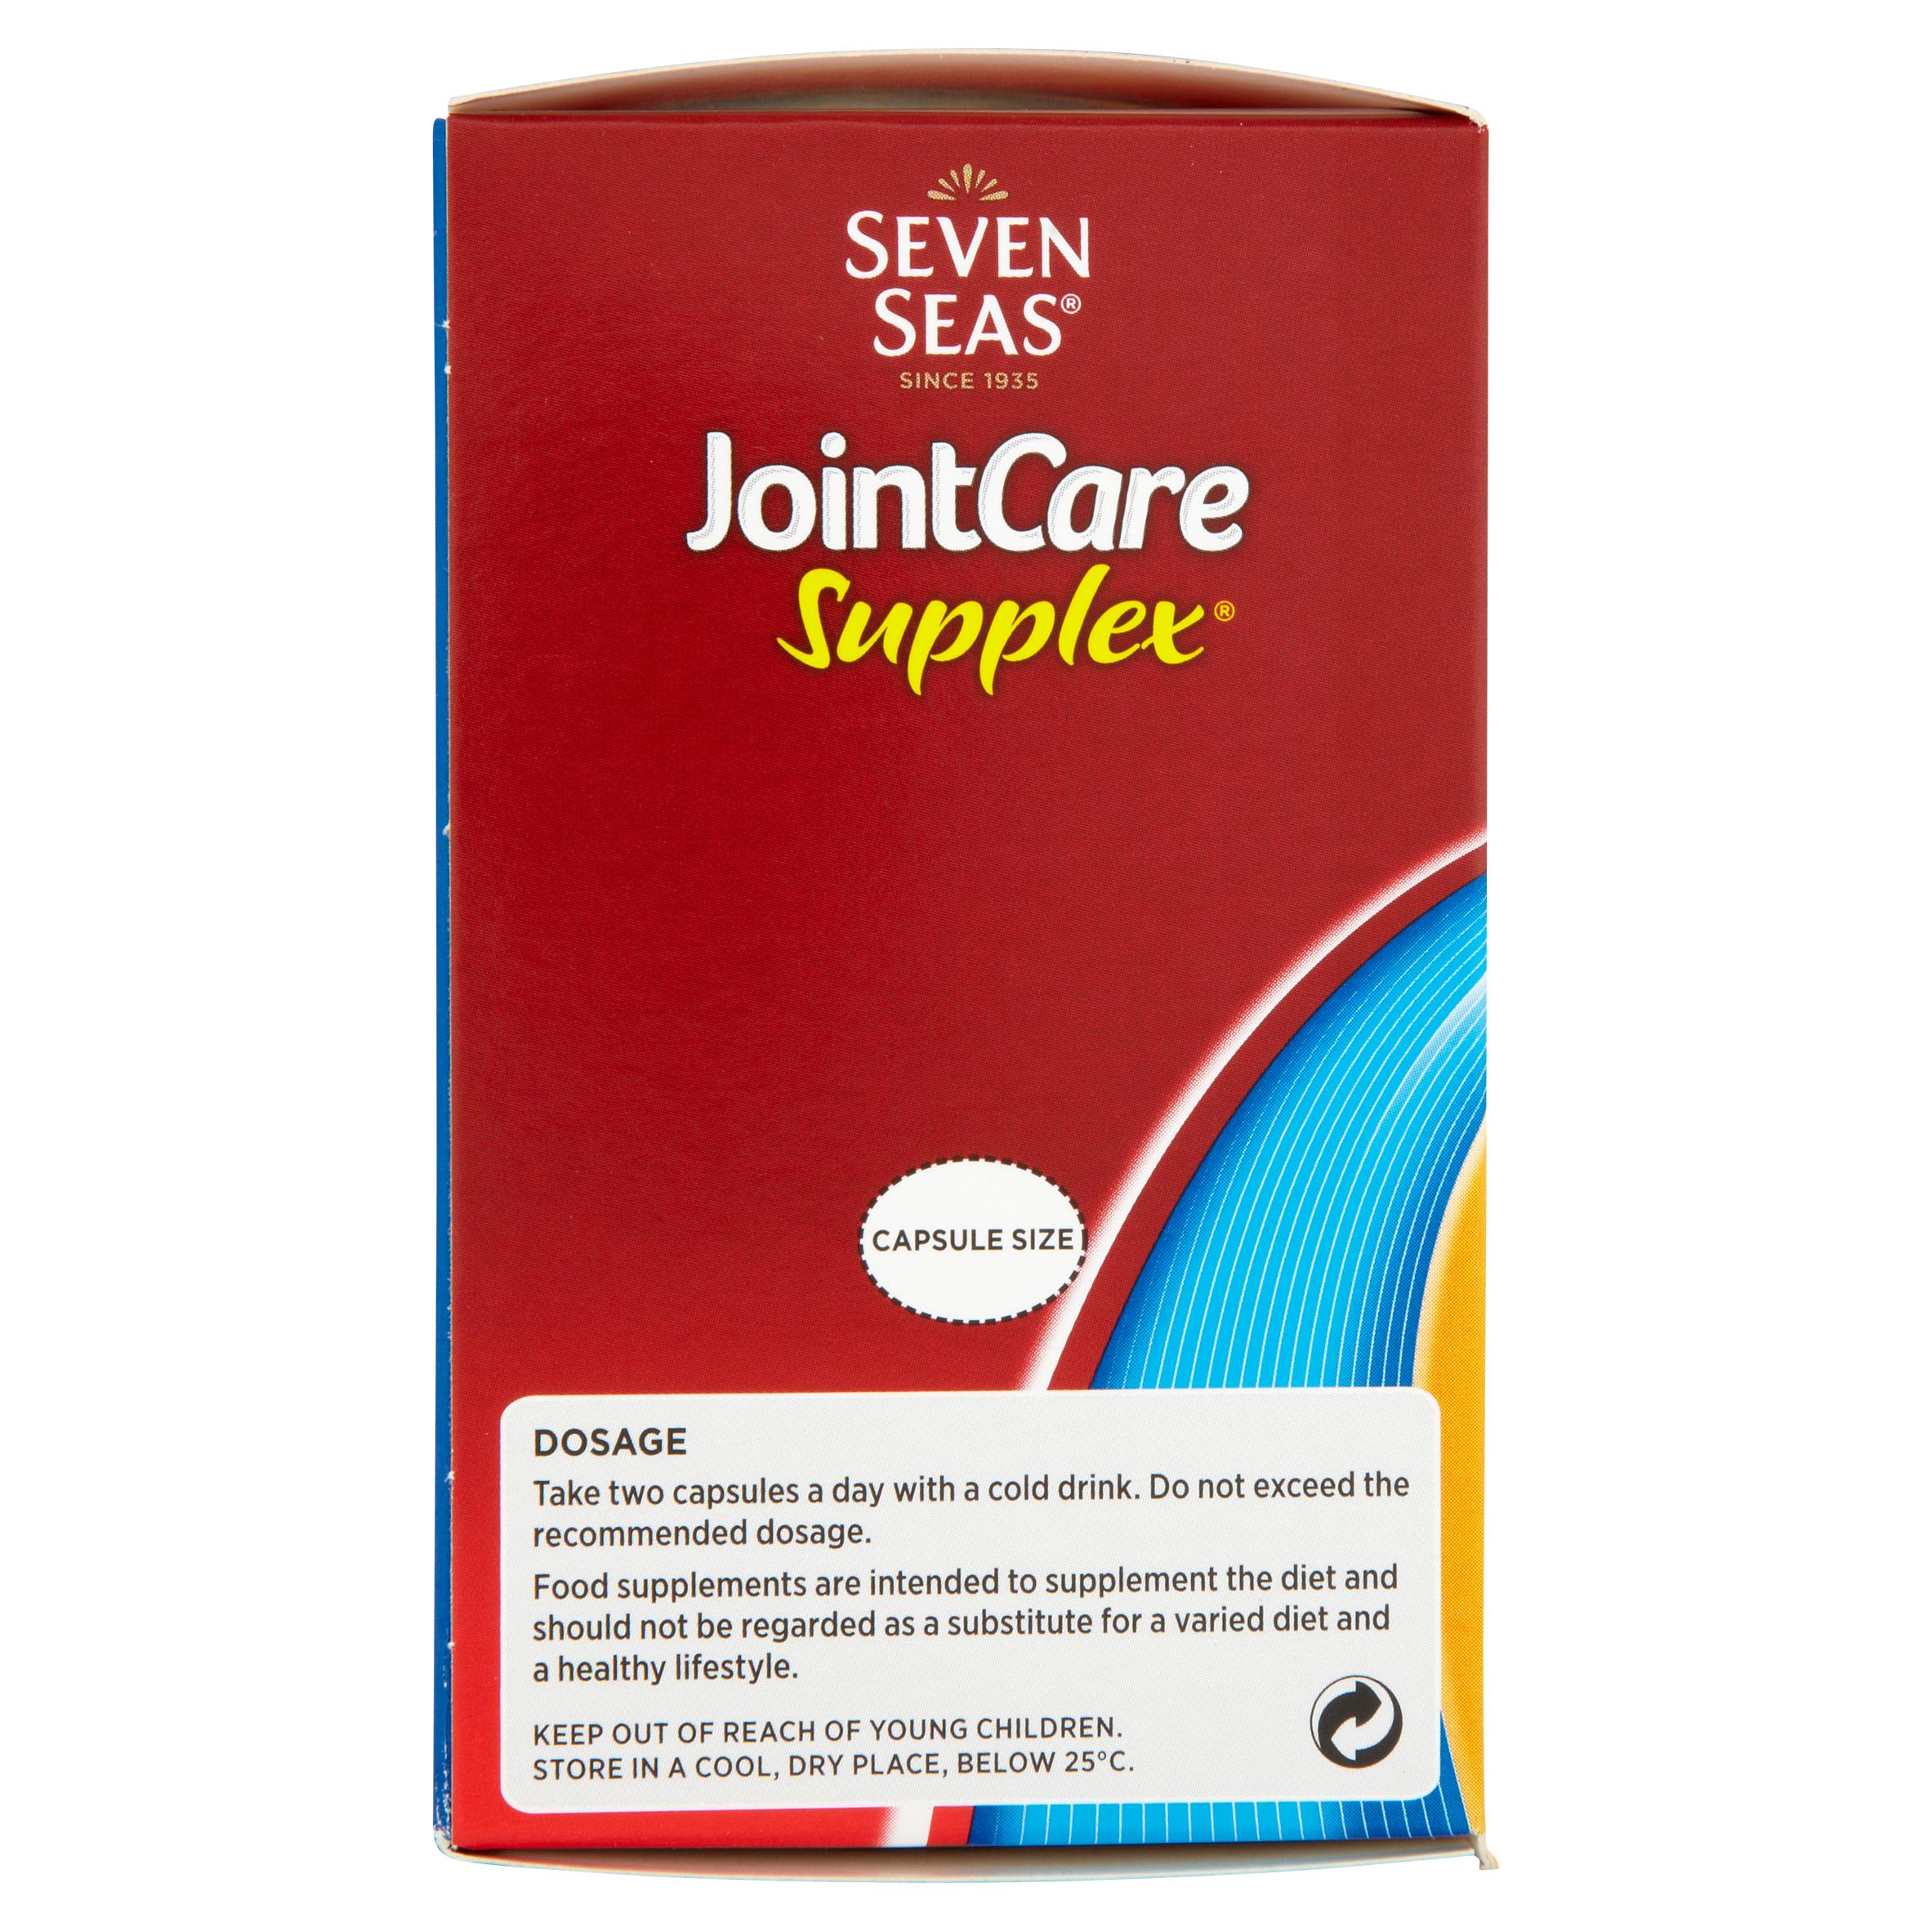 Seven Seas Jointcare Supplex Capsules